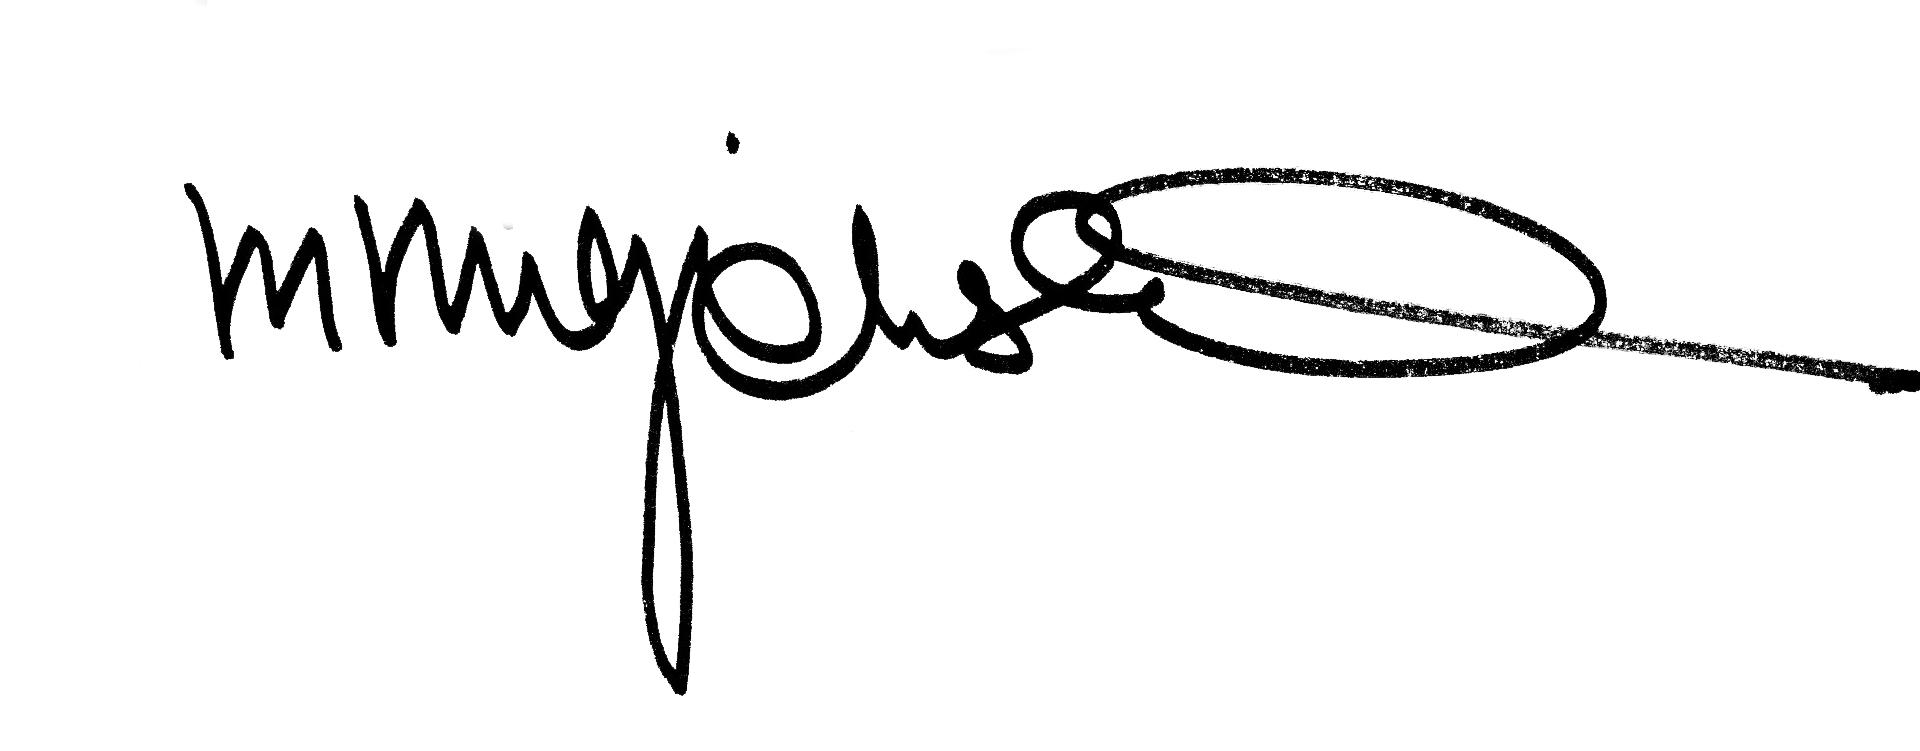 Margo MajEWSKA's Signature